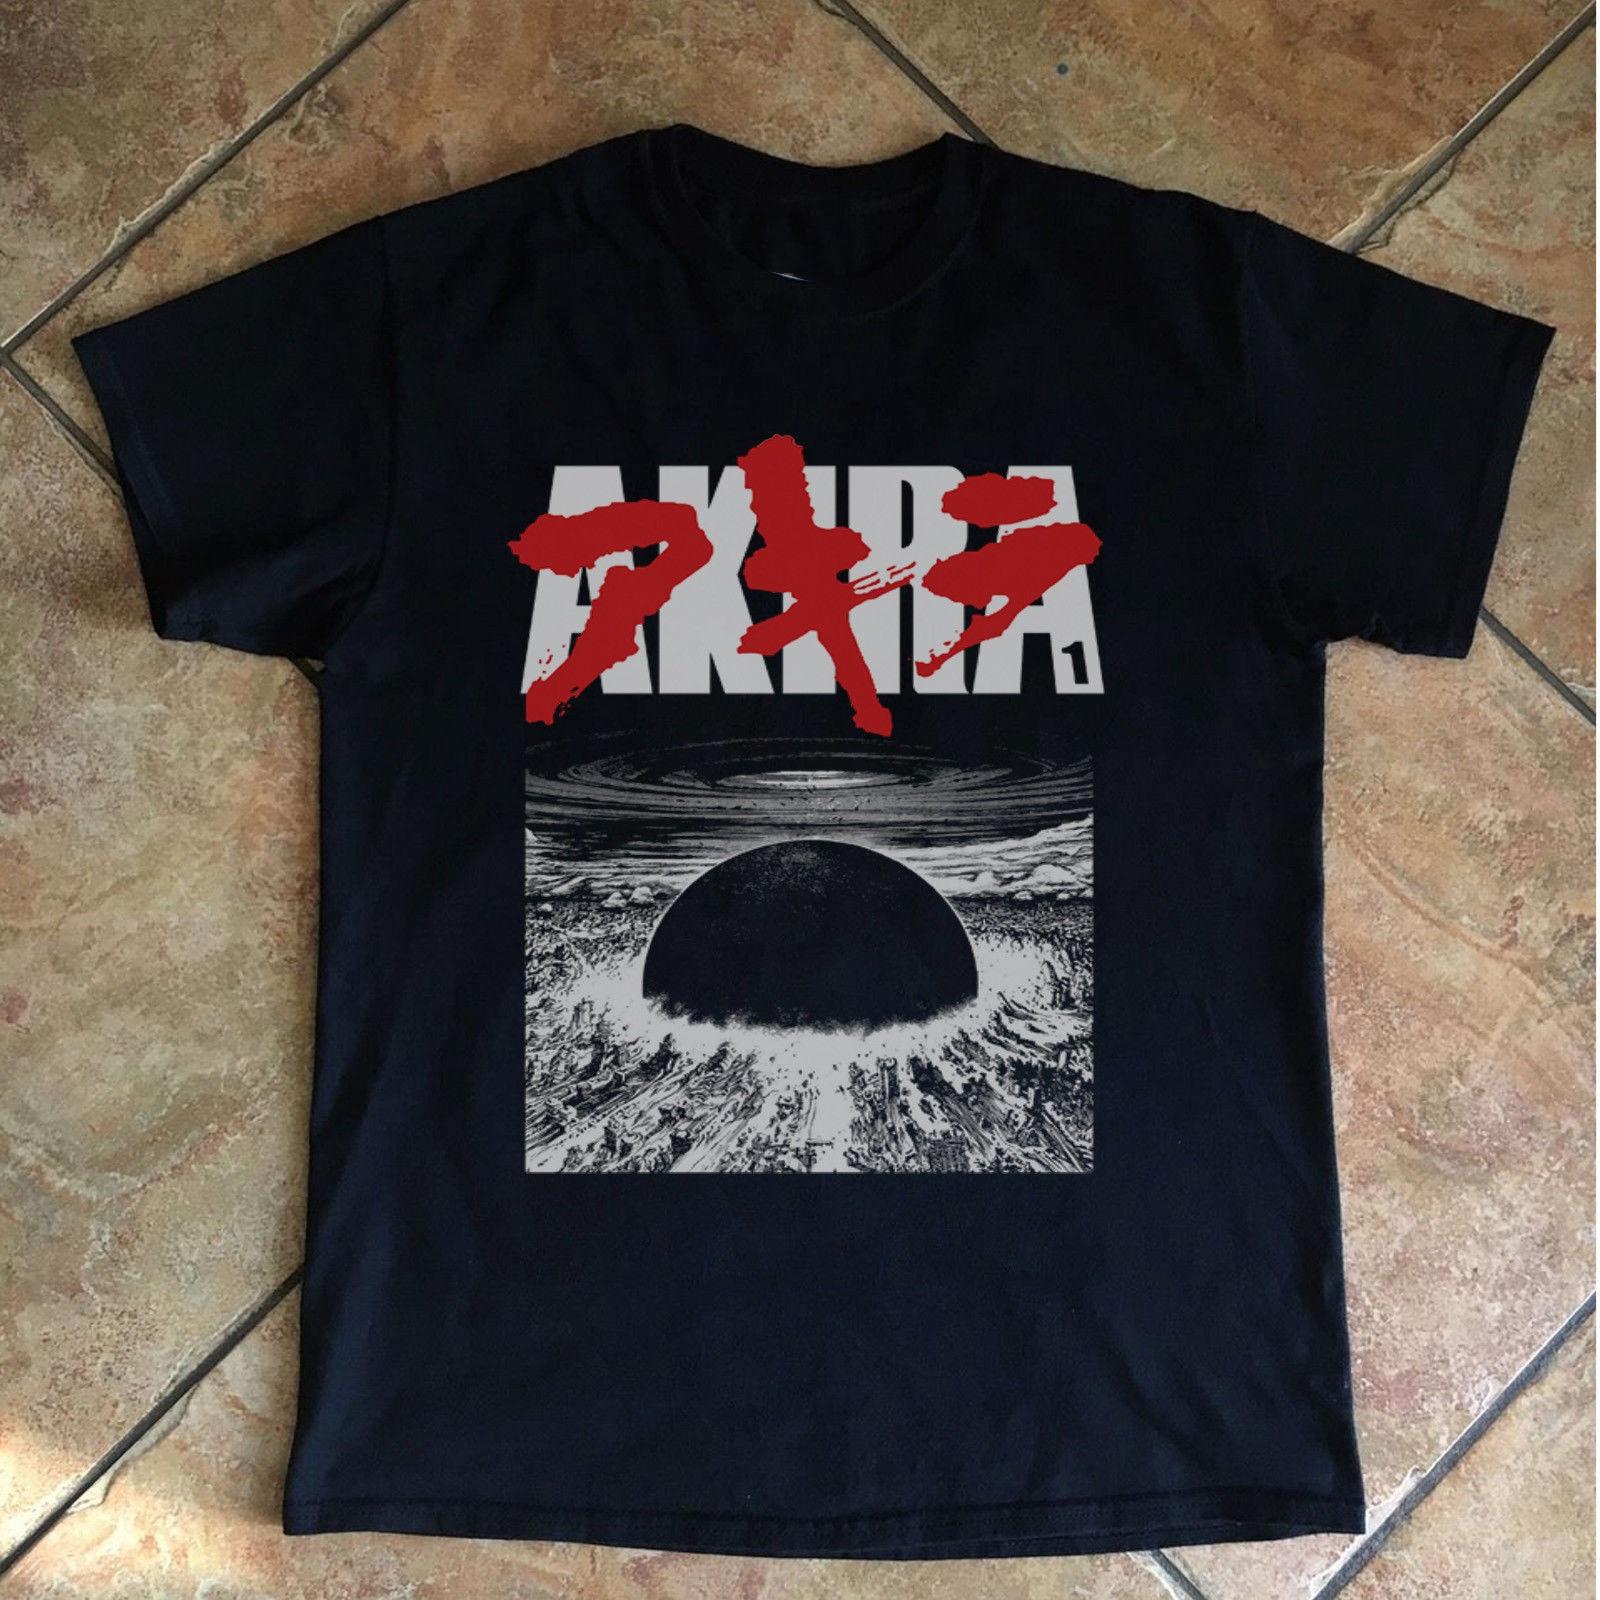 Vintage Shirt Akira T shirt 1989 Game Anime Movie Japan Black T-Shirt Reprint XS - 2XL Short Sleeve Plus Size t-shirt